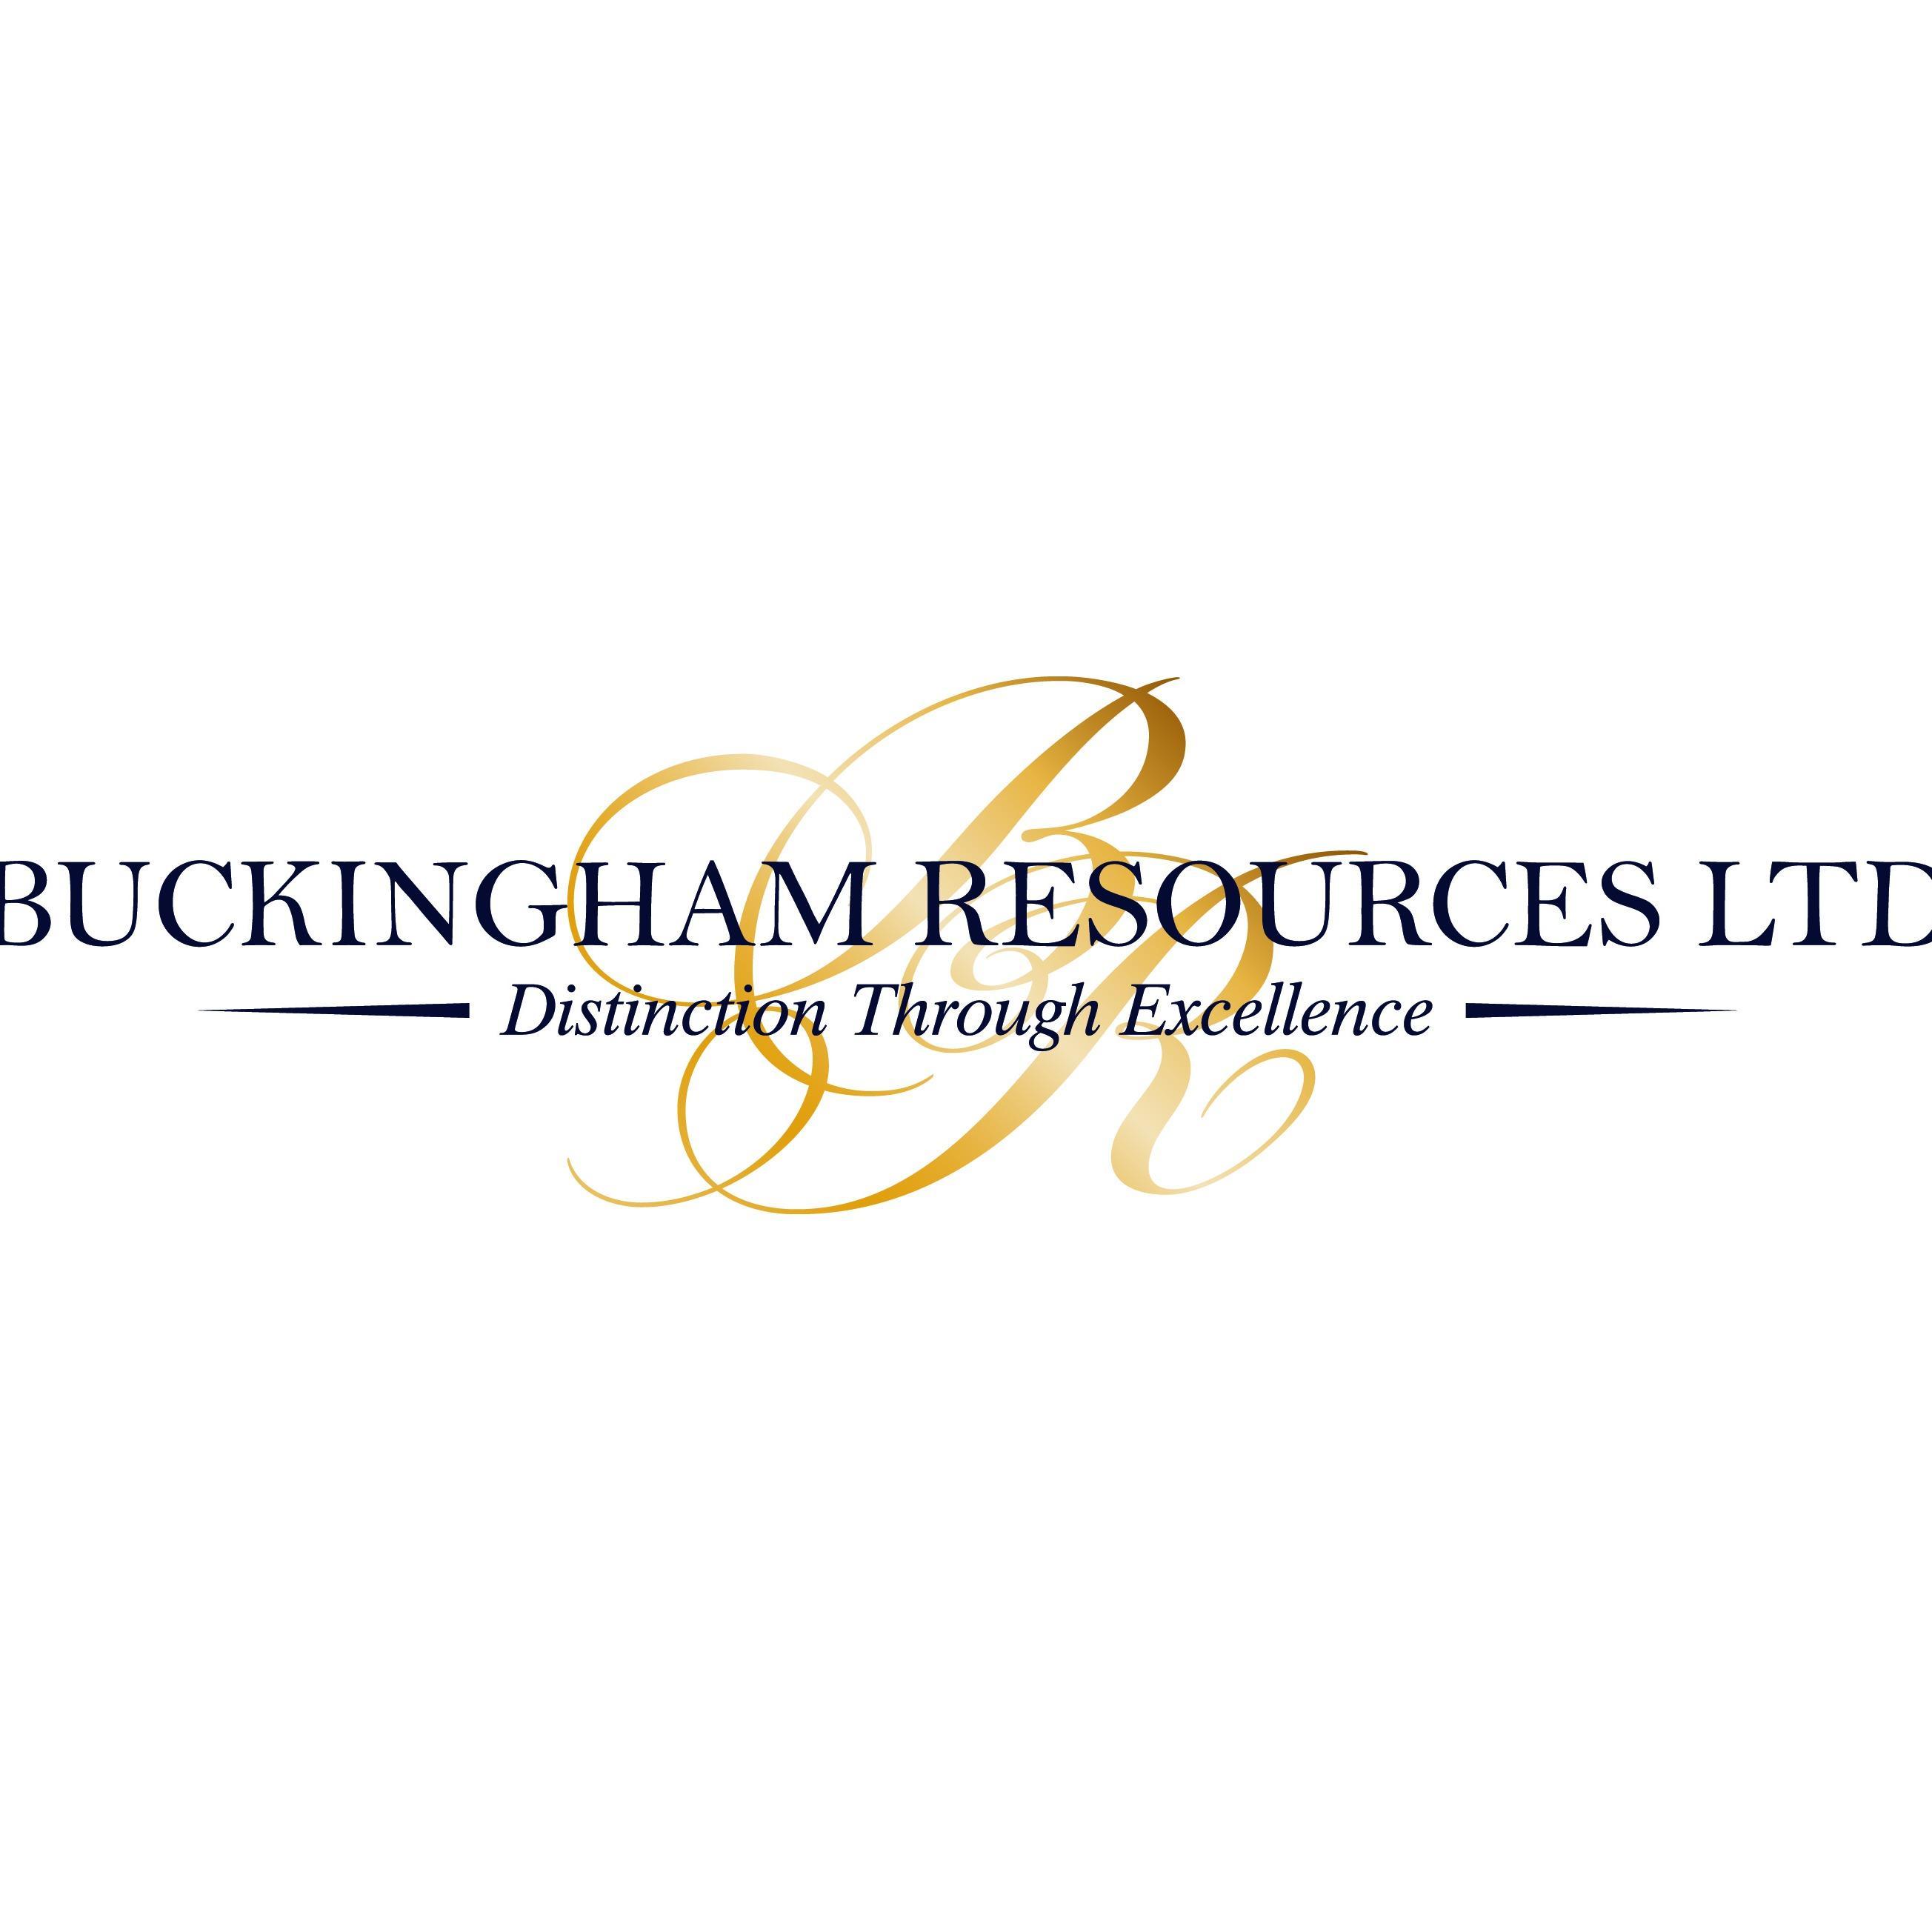 Buckingham Resources LTD